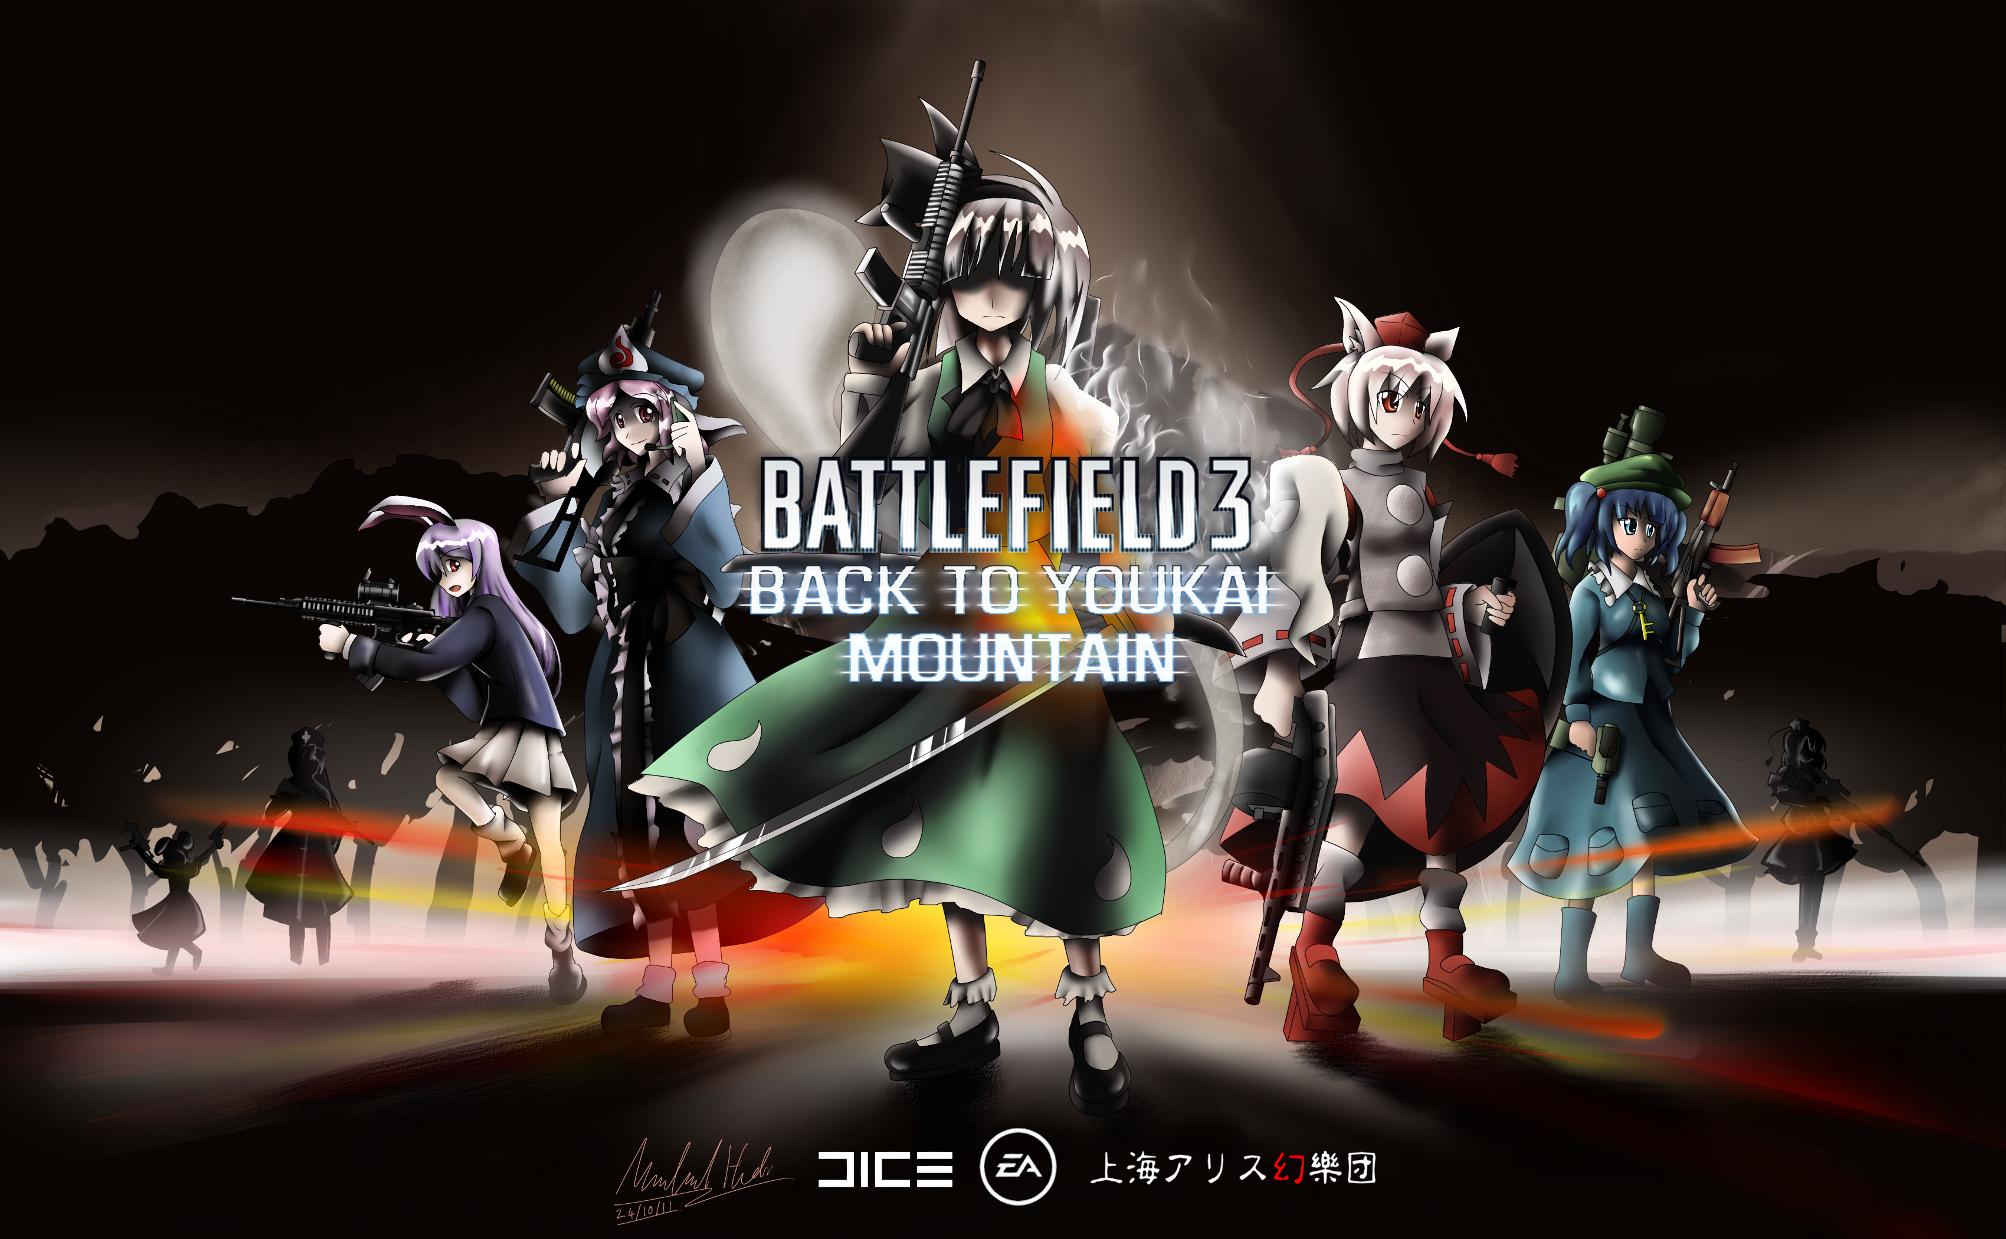 Battlefield 3 back to youkai mountain image anime fans of moddb original voltagebd Gallery